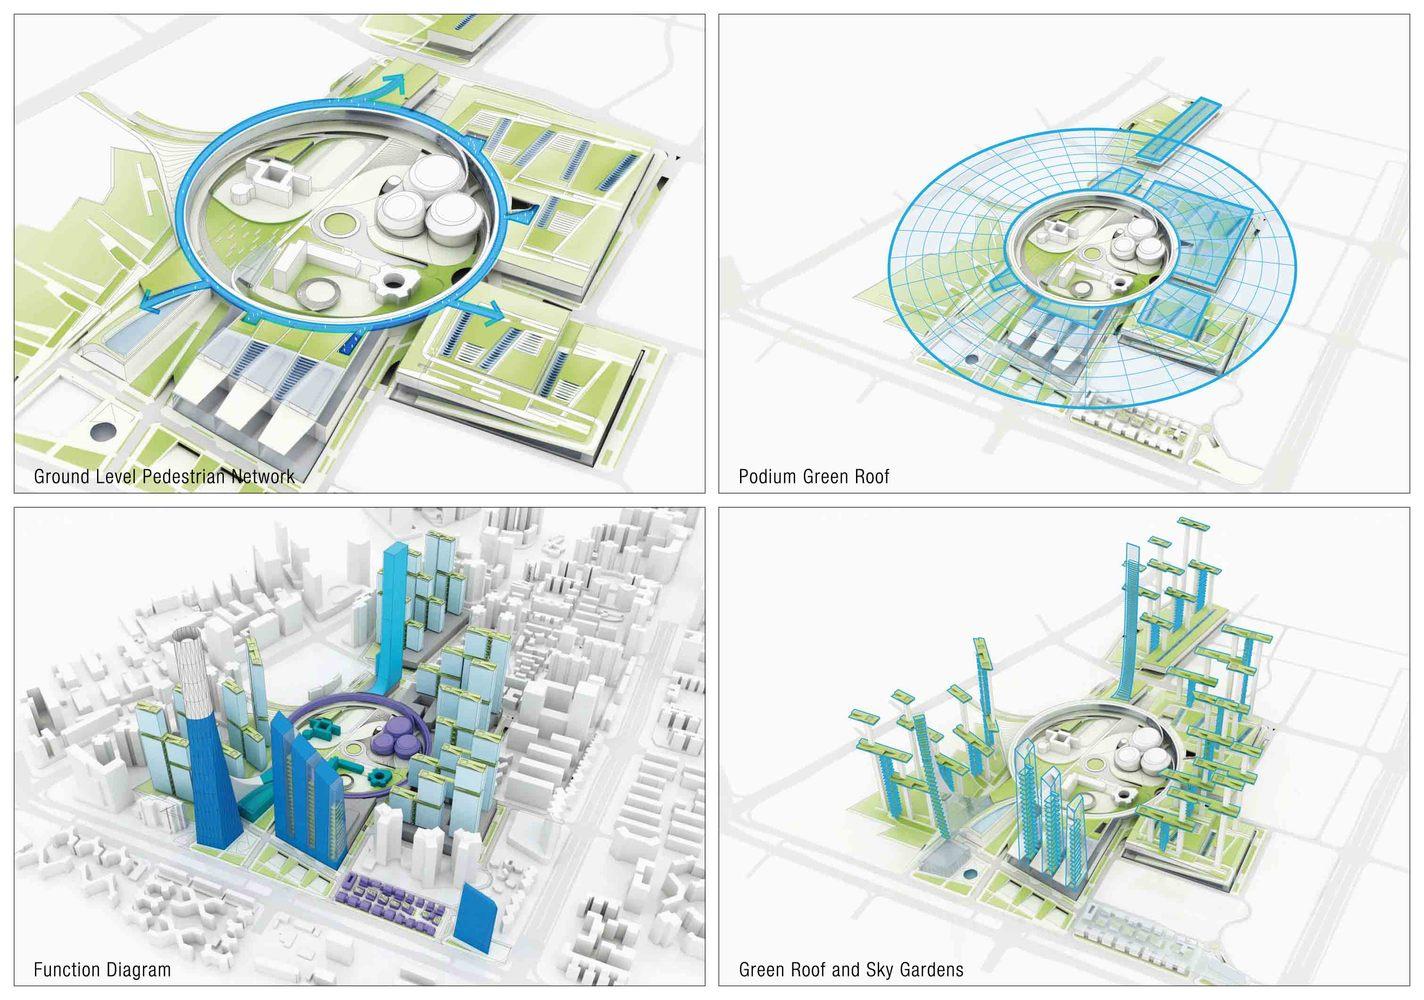 gallery of hanking nanyou newtown urban planning design proposal Urban Planner Kevin Lynch